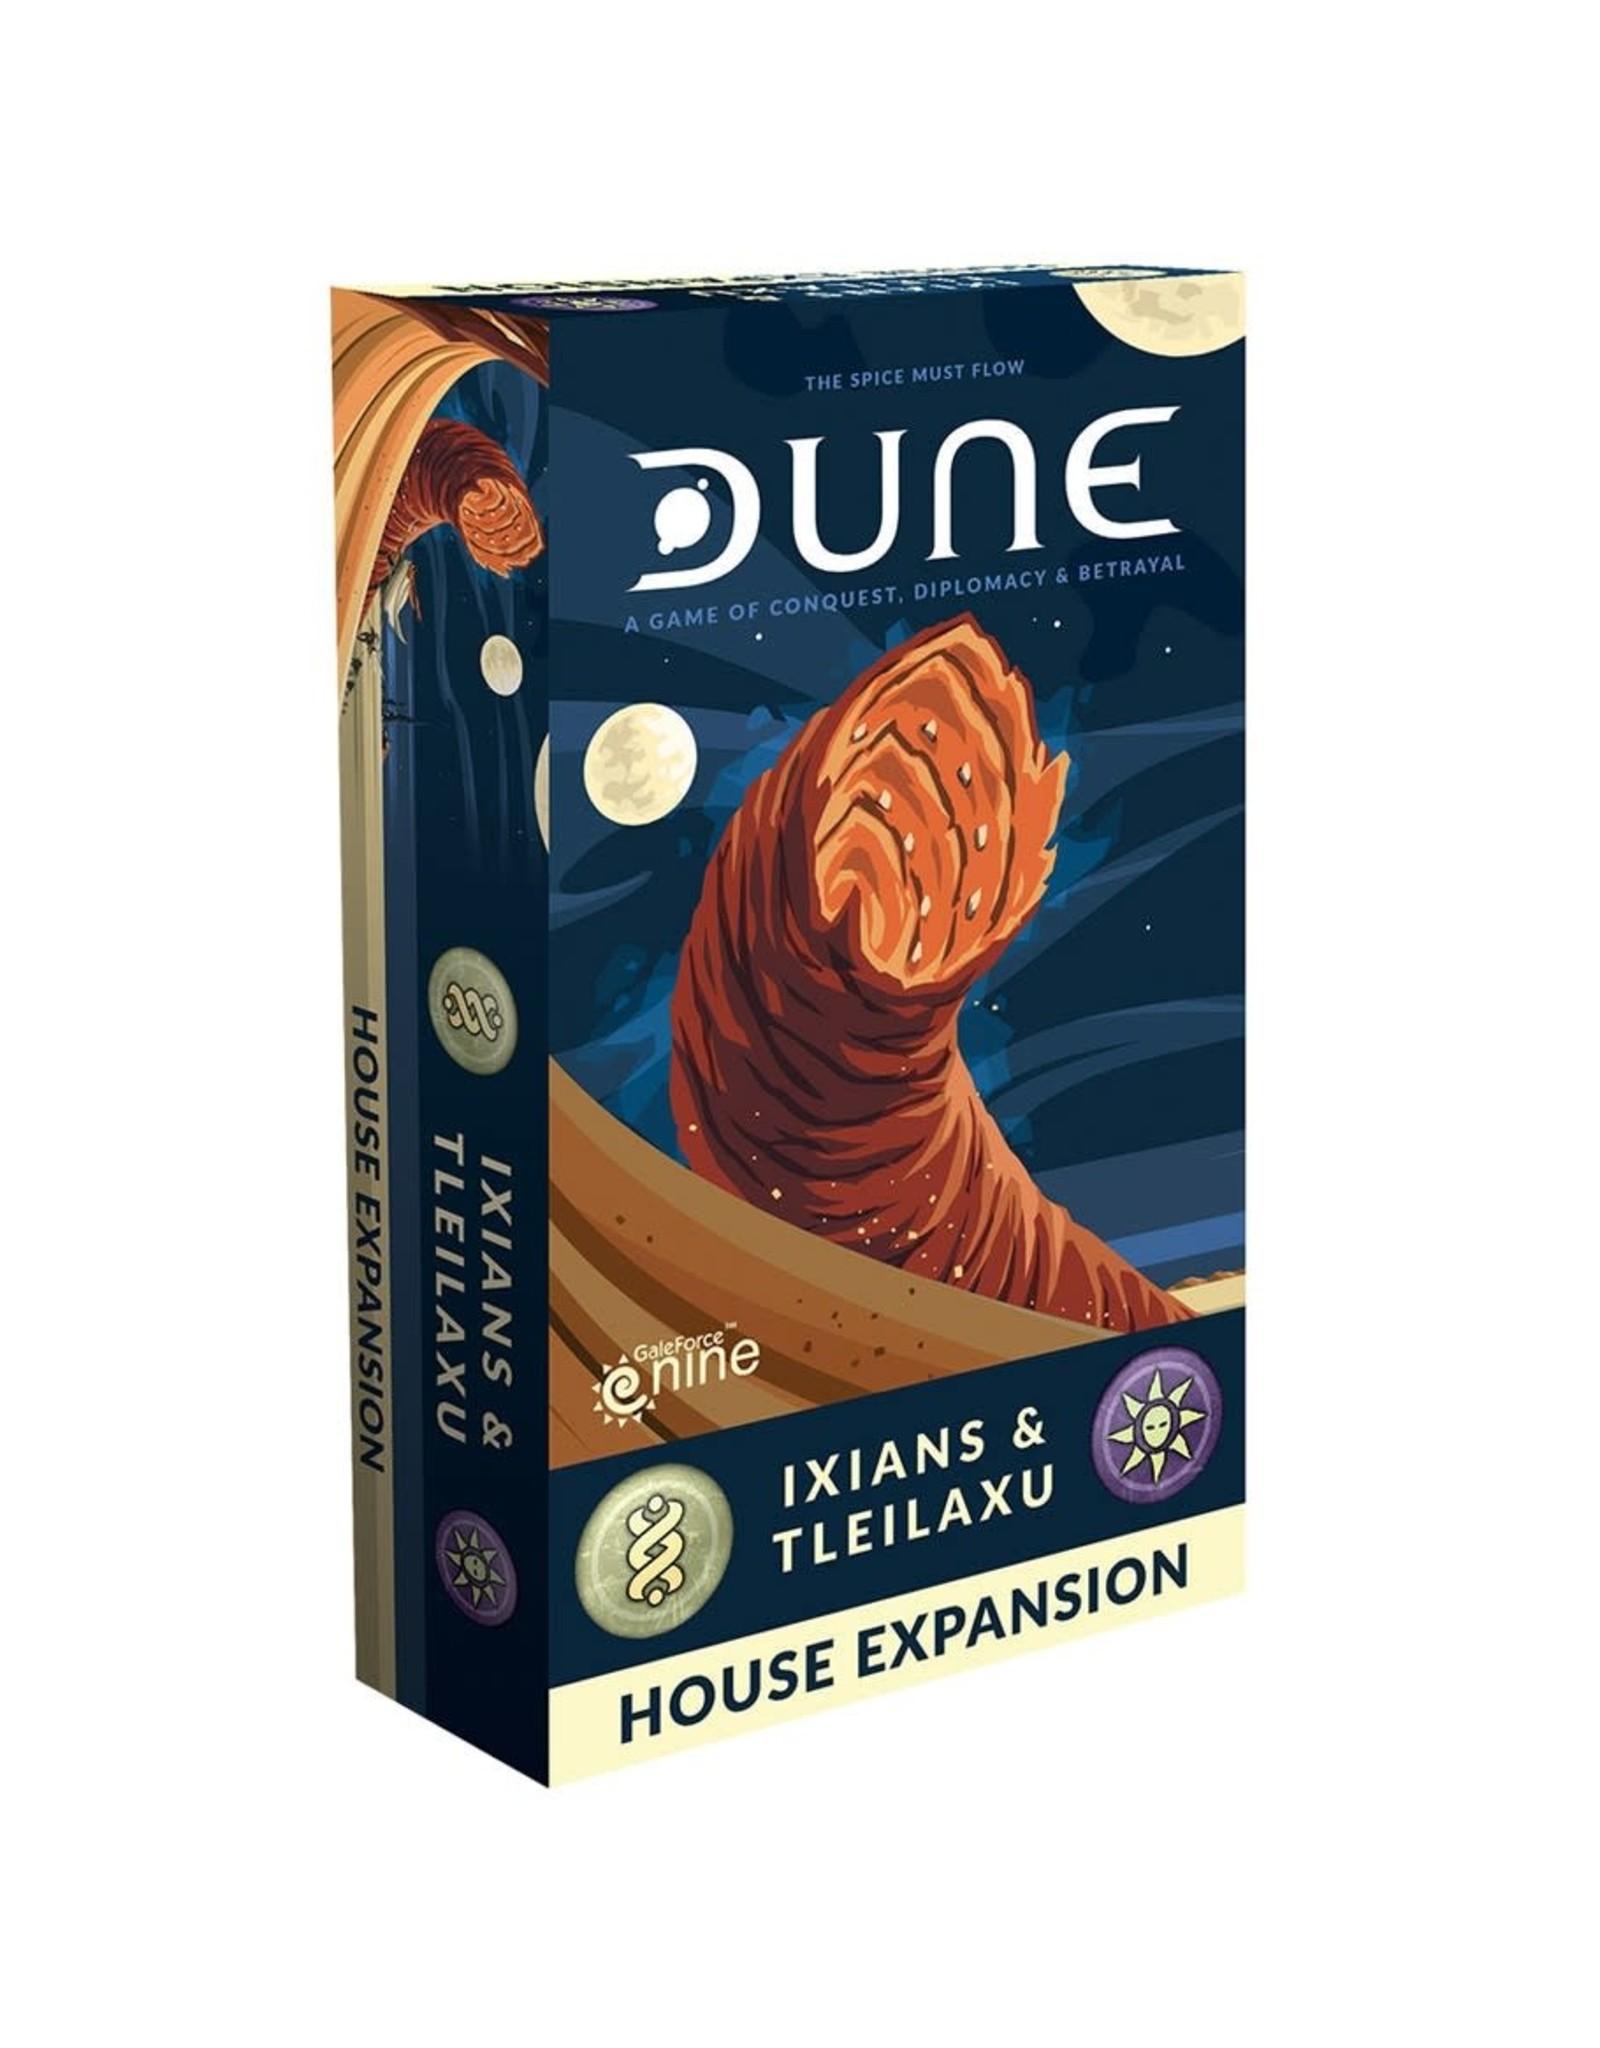 Gale Force Nine Dune: Ixians & Tleilaxu House Expansion